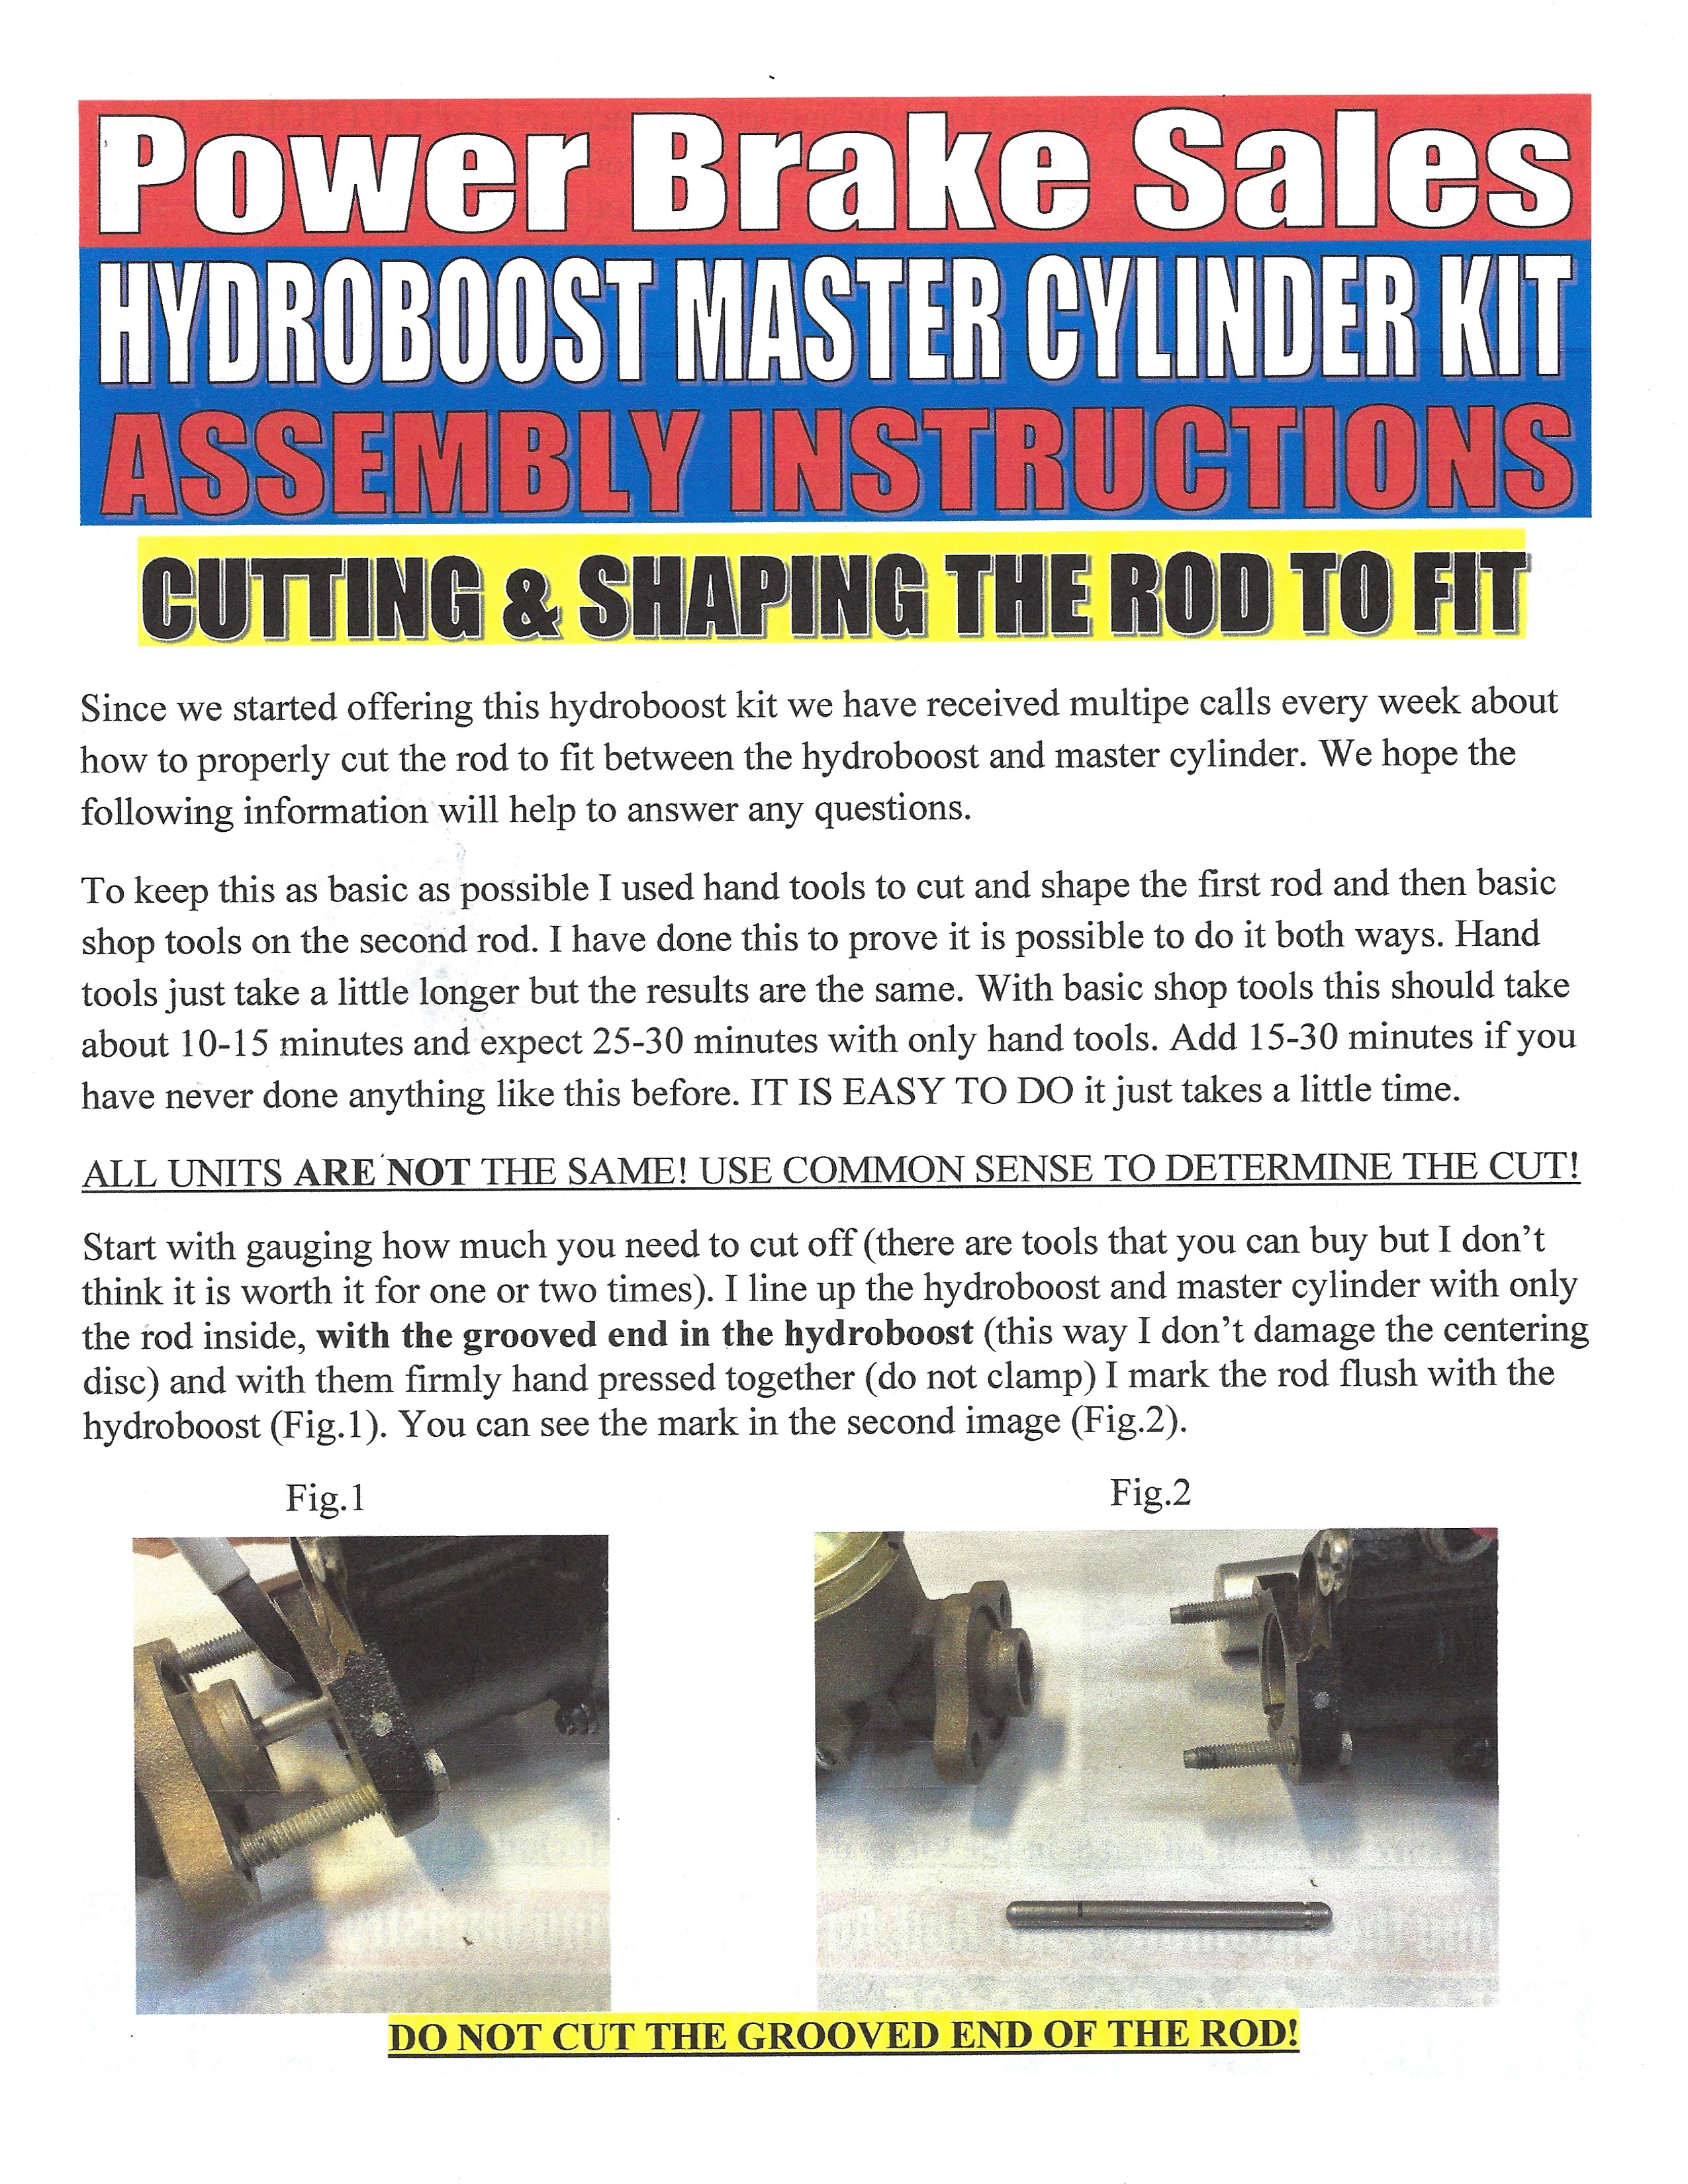 Hydroboost Kit Cut Rod Instructions